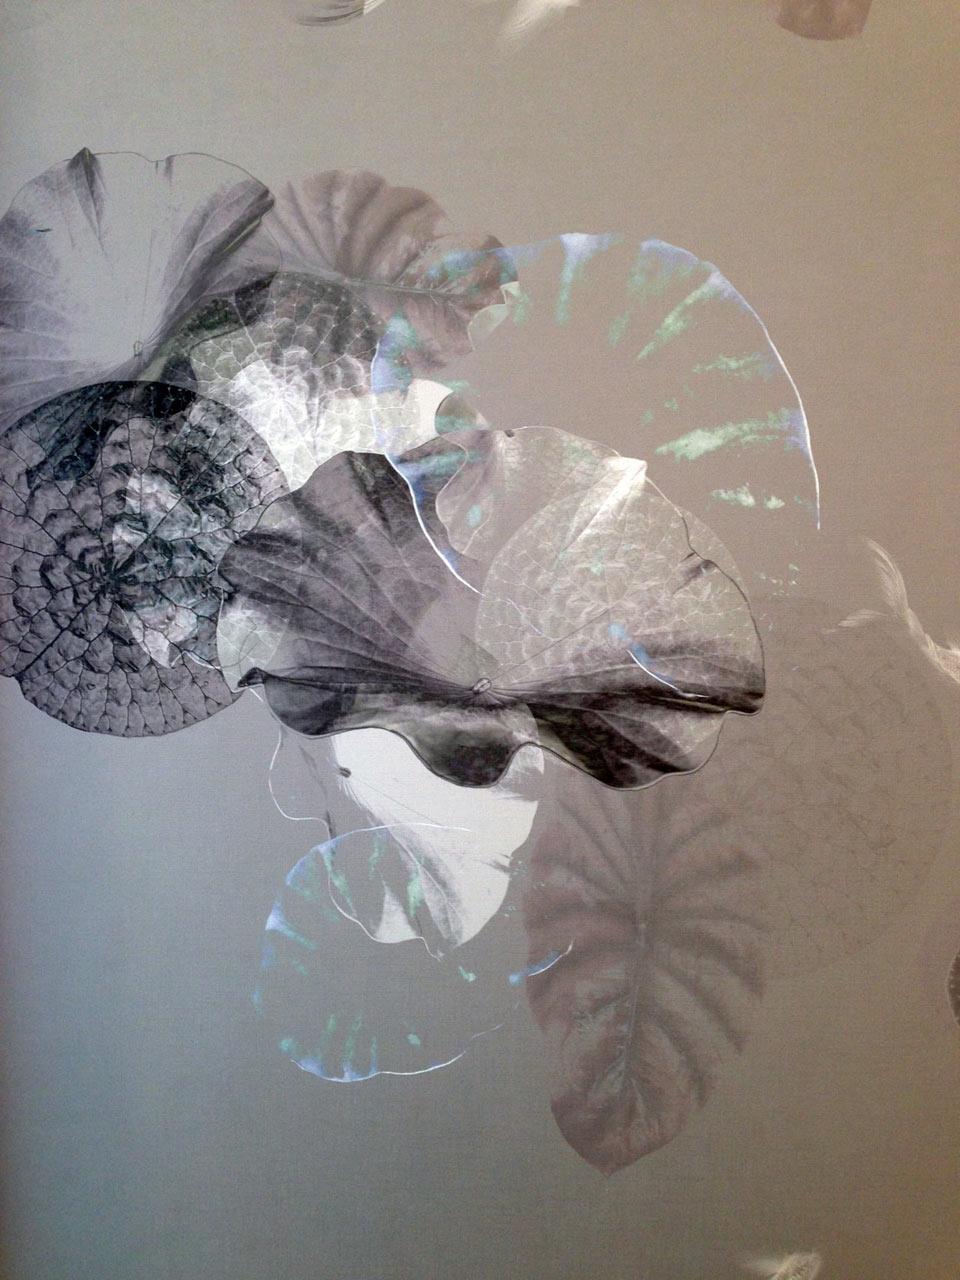 ICFF4-4-trove-wallpaper-icff-2014